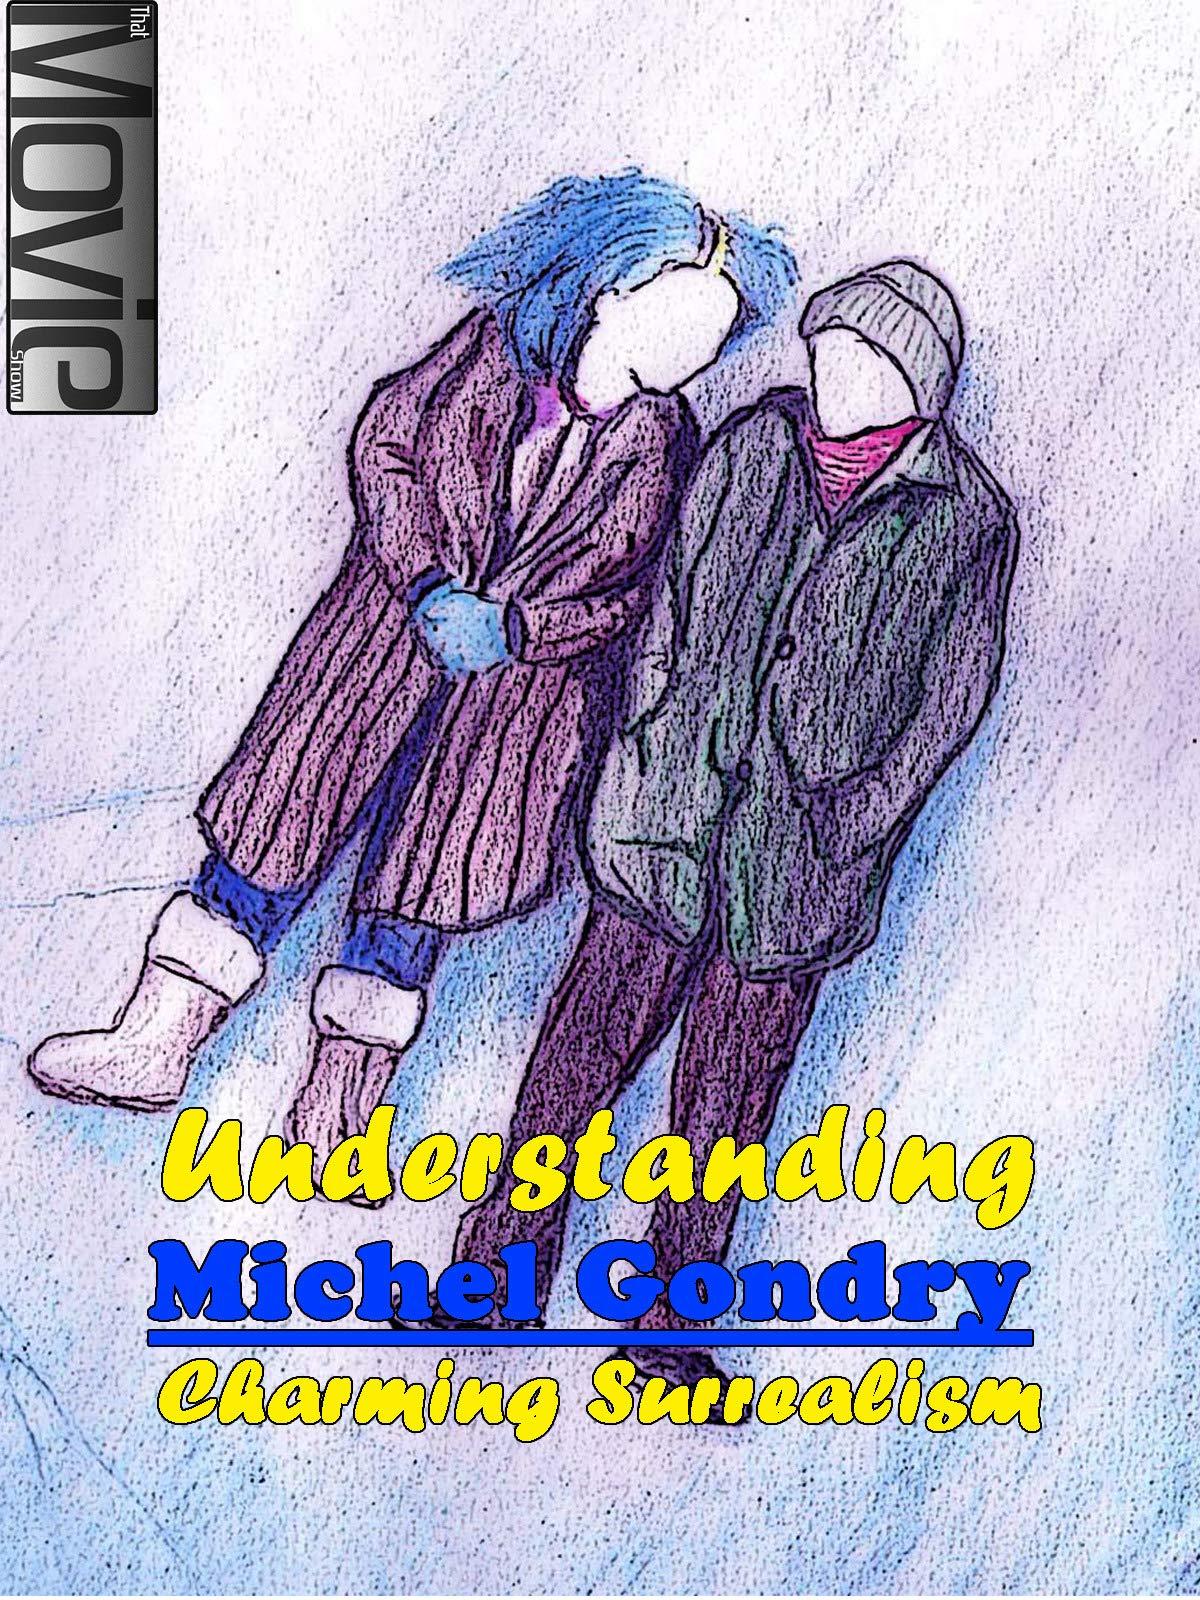 Understanding Michel Gondry - Surrealistic Charm